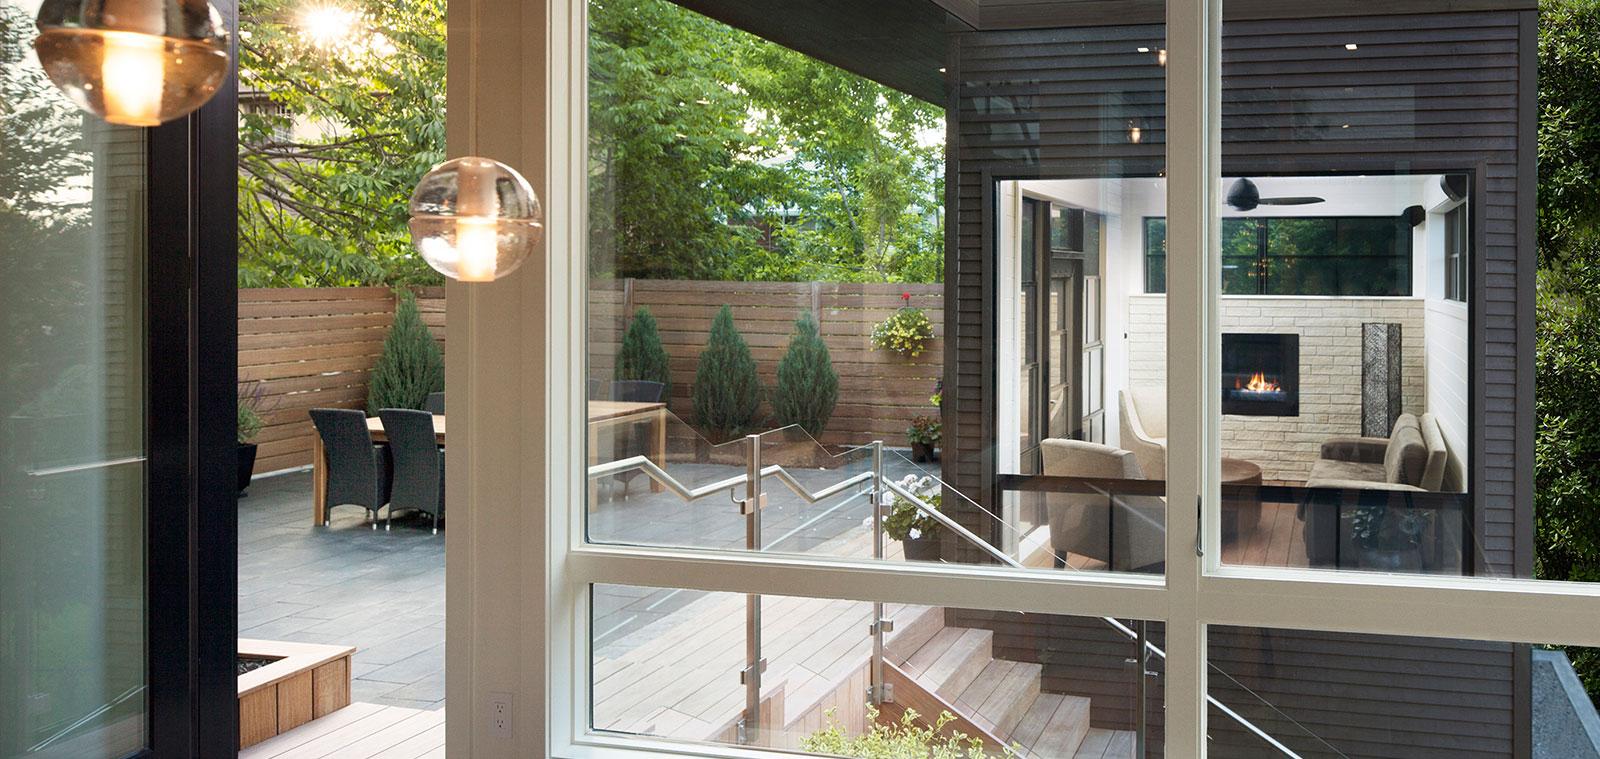 Stylish Home With Beautiful Terrace And Three-Season Reading Pavilion